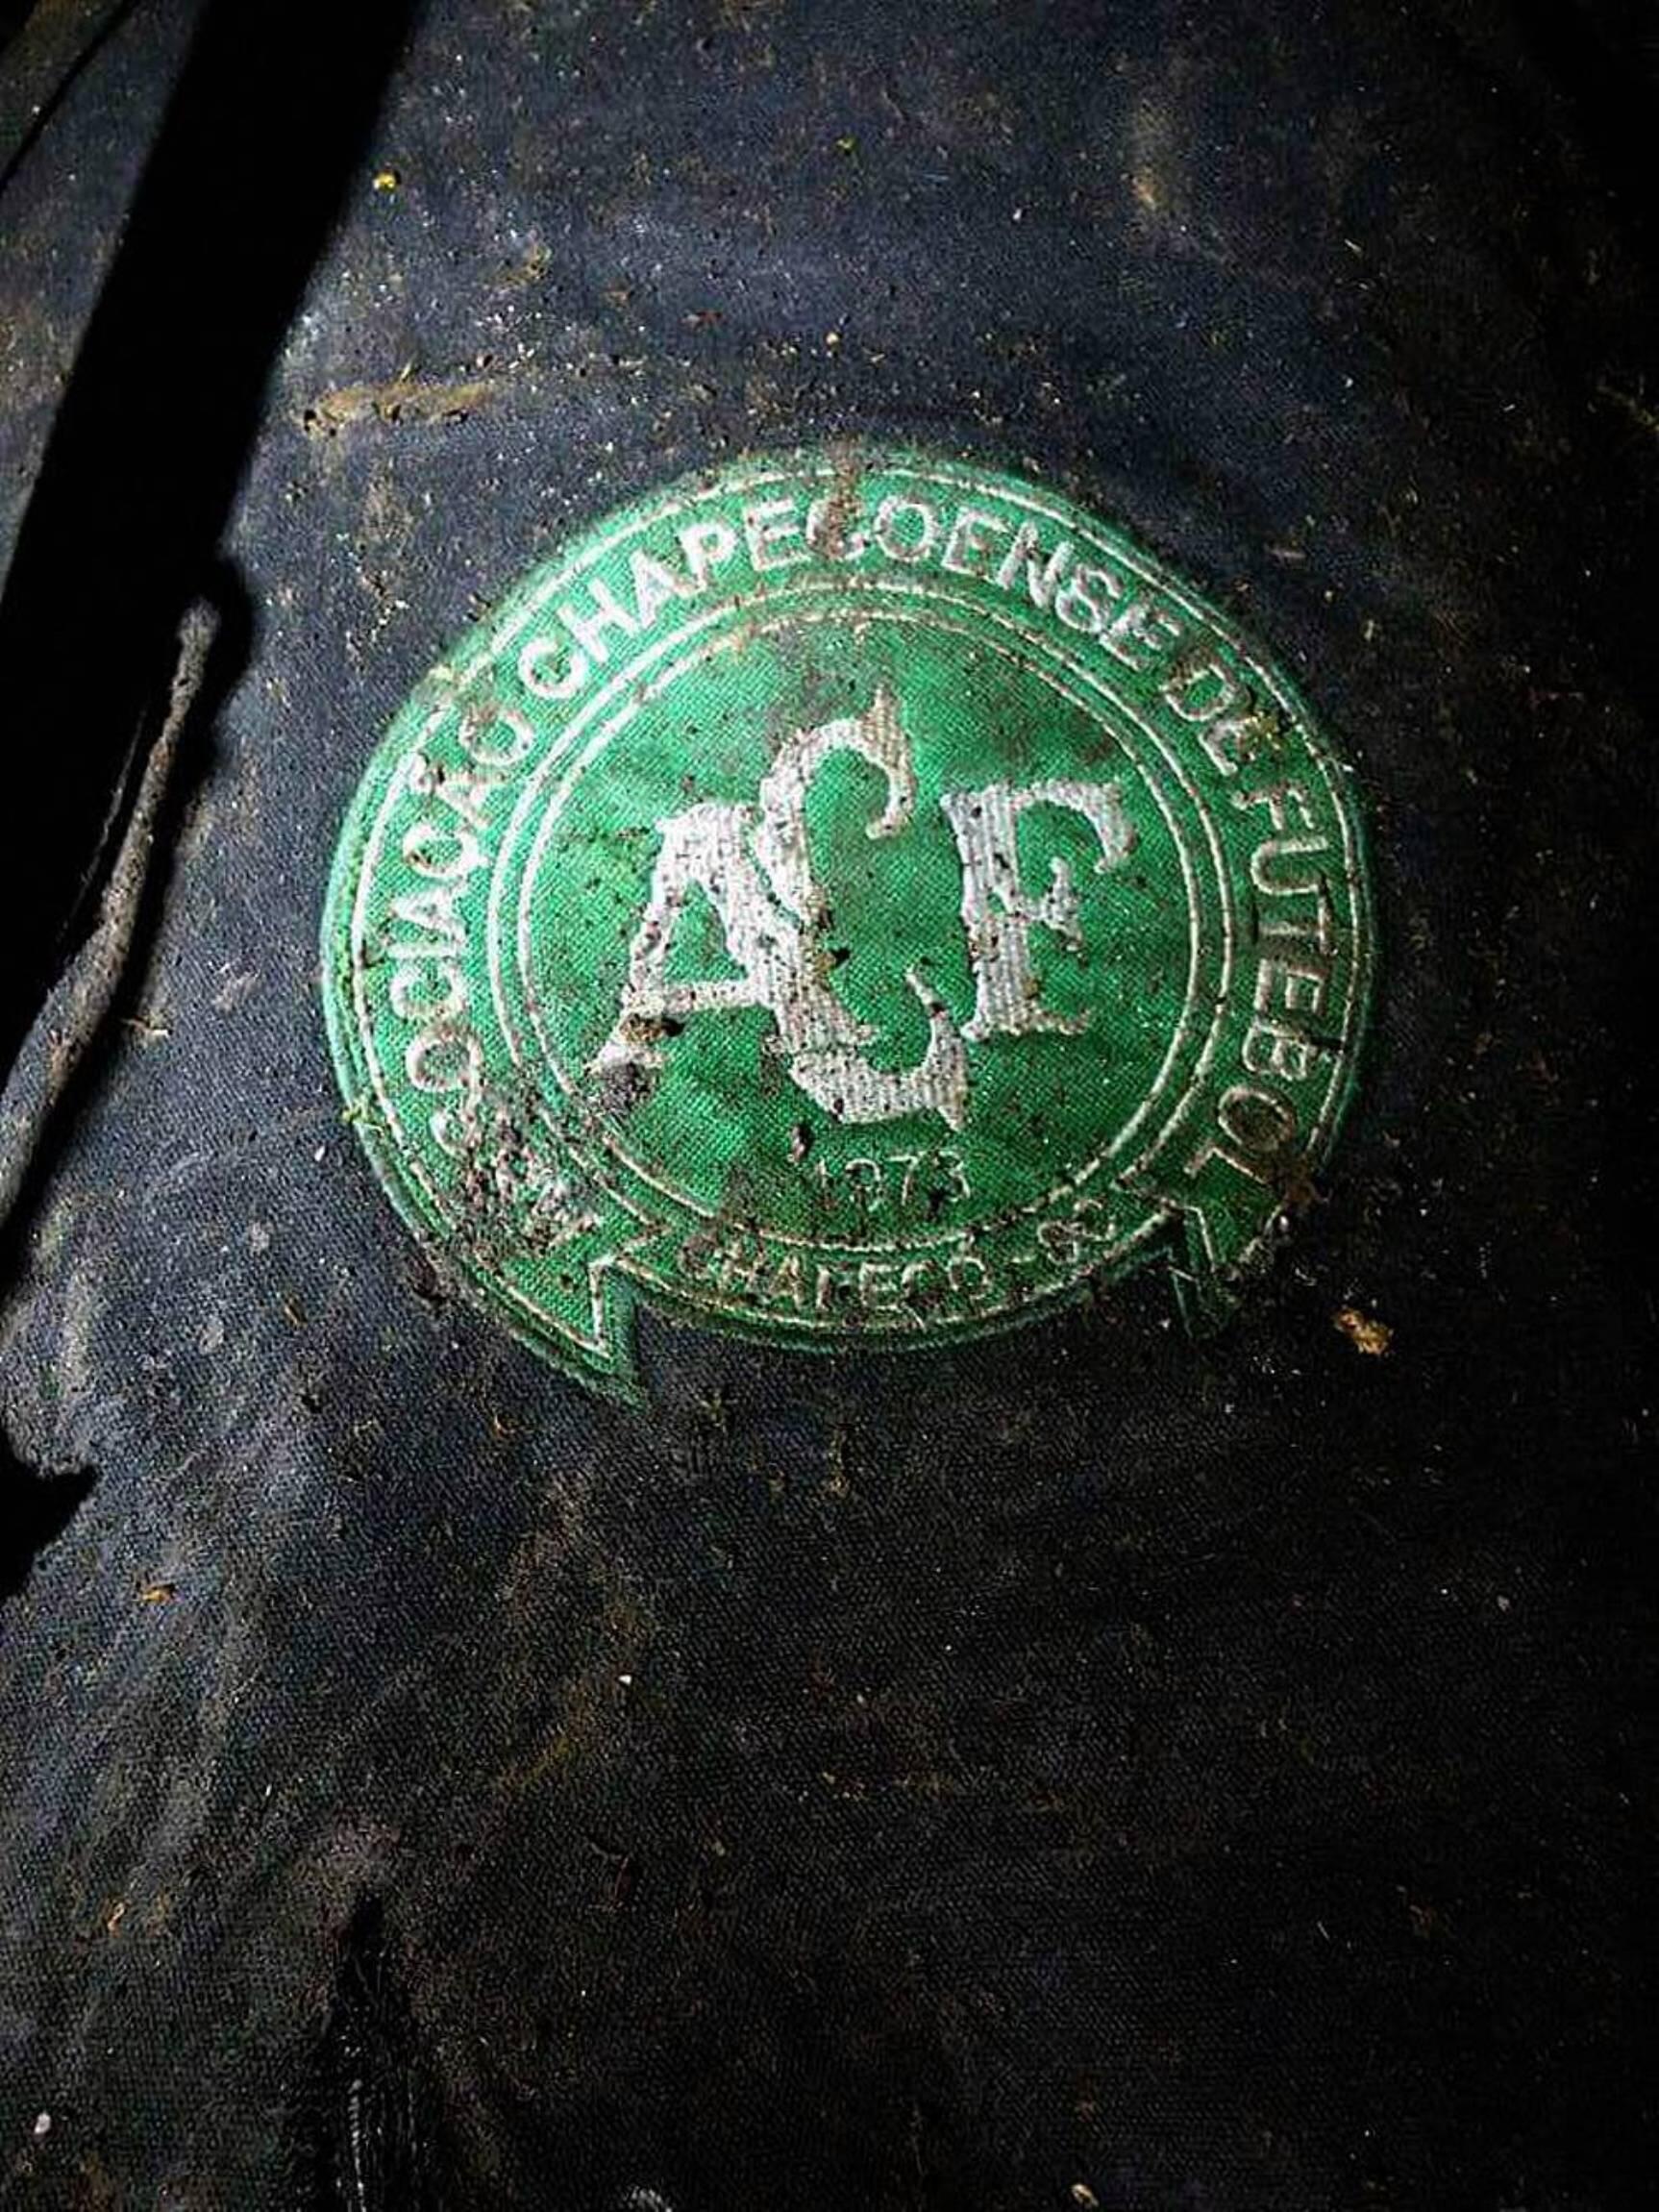 Bild zu Chapecoense, Flugzeugabsturz, AF, Ronaldinho, Ze Roberto